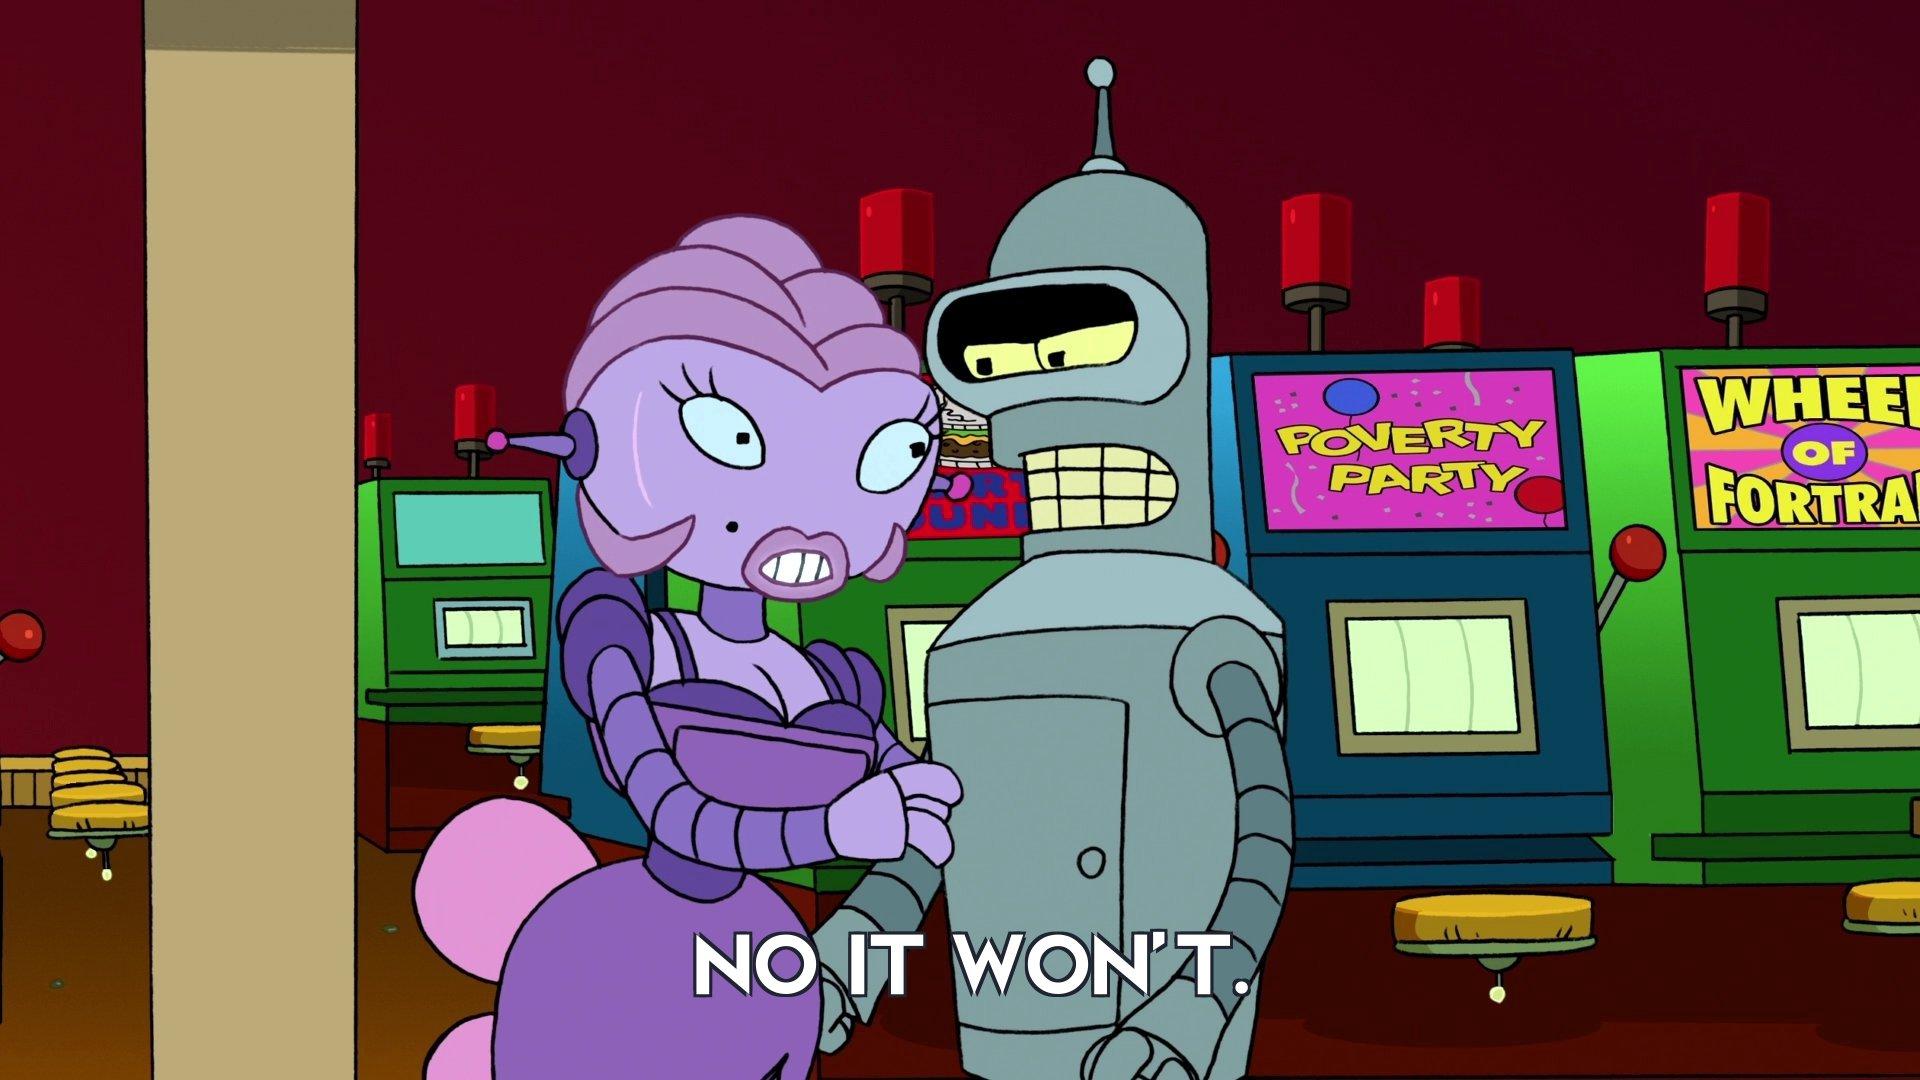 Fanny: No it won't.